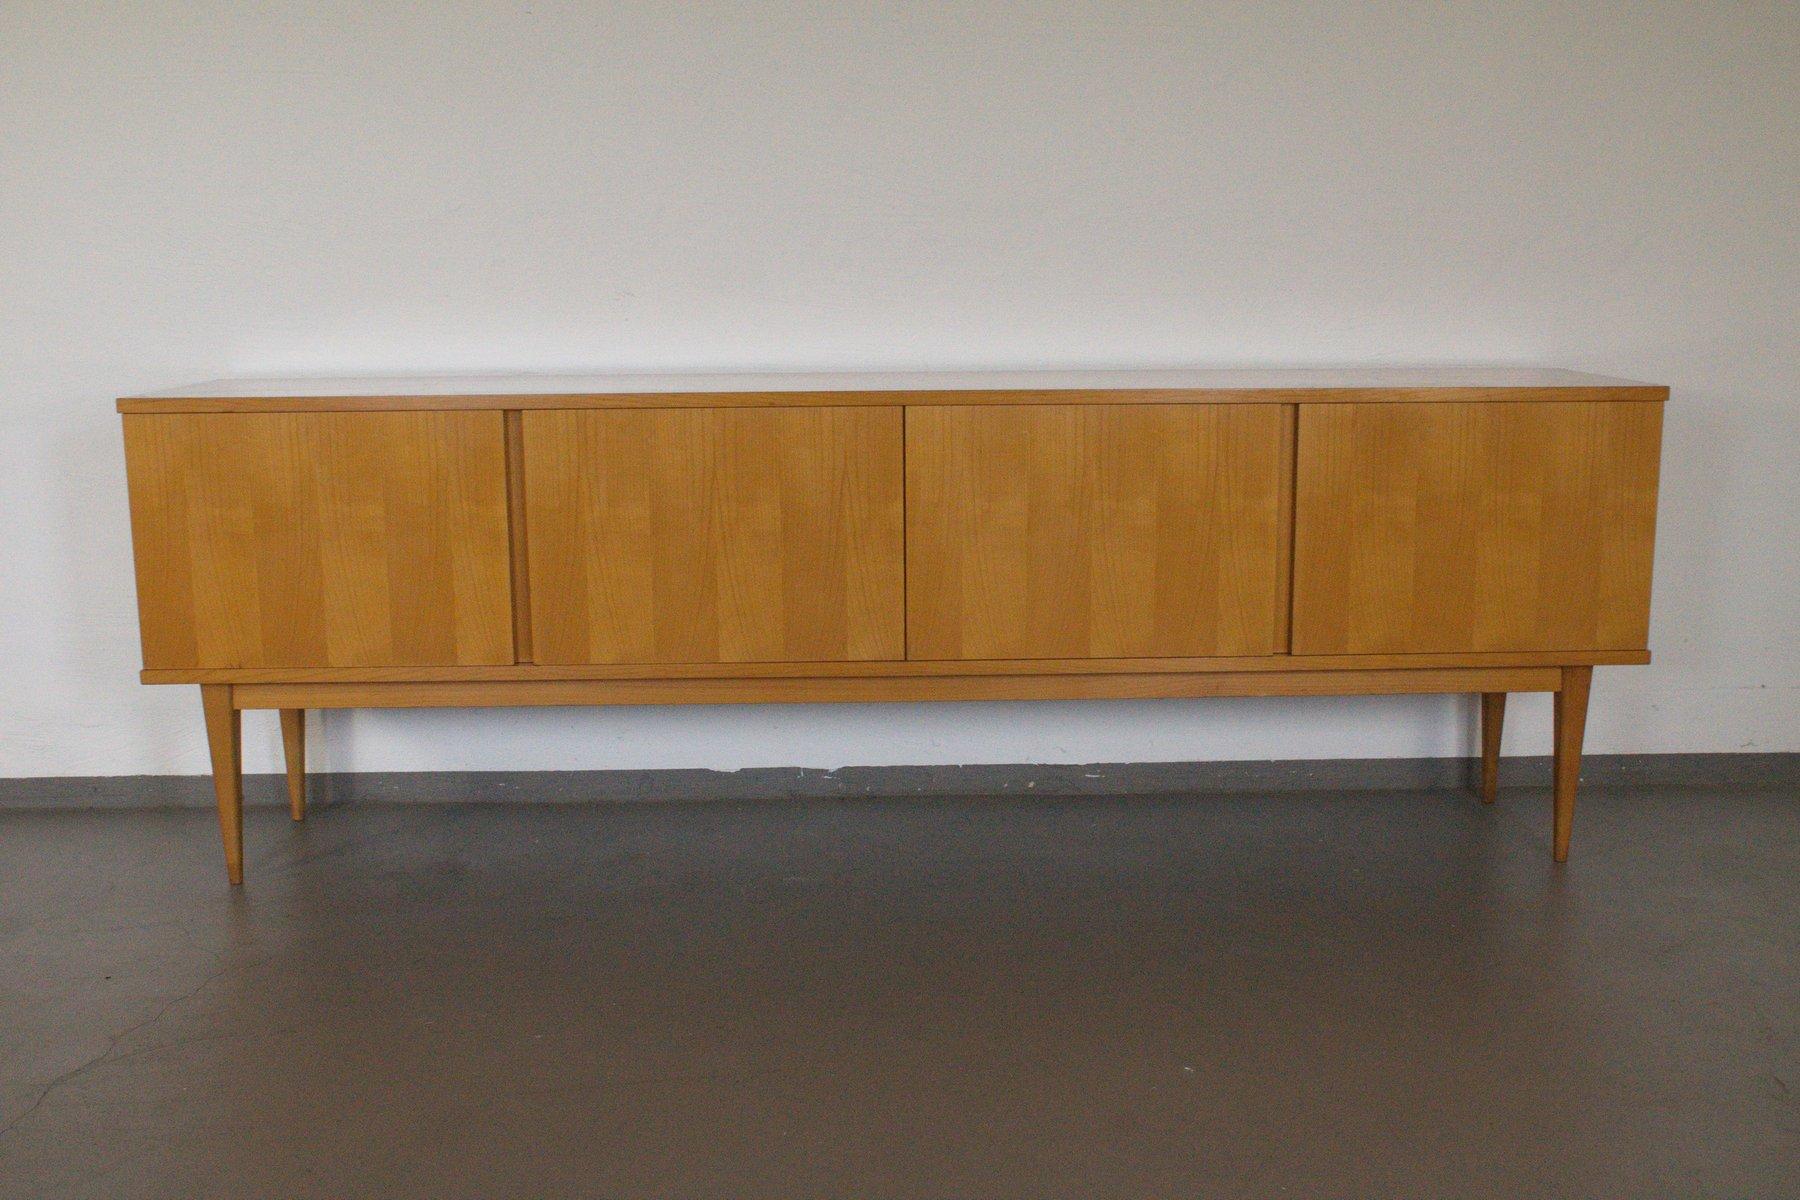 sideboard aus kirschholz von wk m bel 1960er bei pamono. Black Bedroom Furniture Sets. Home Design Ideas